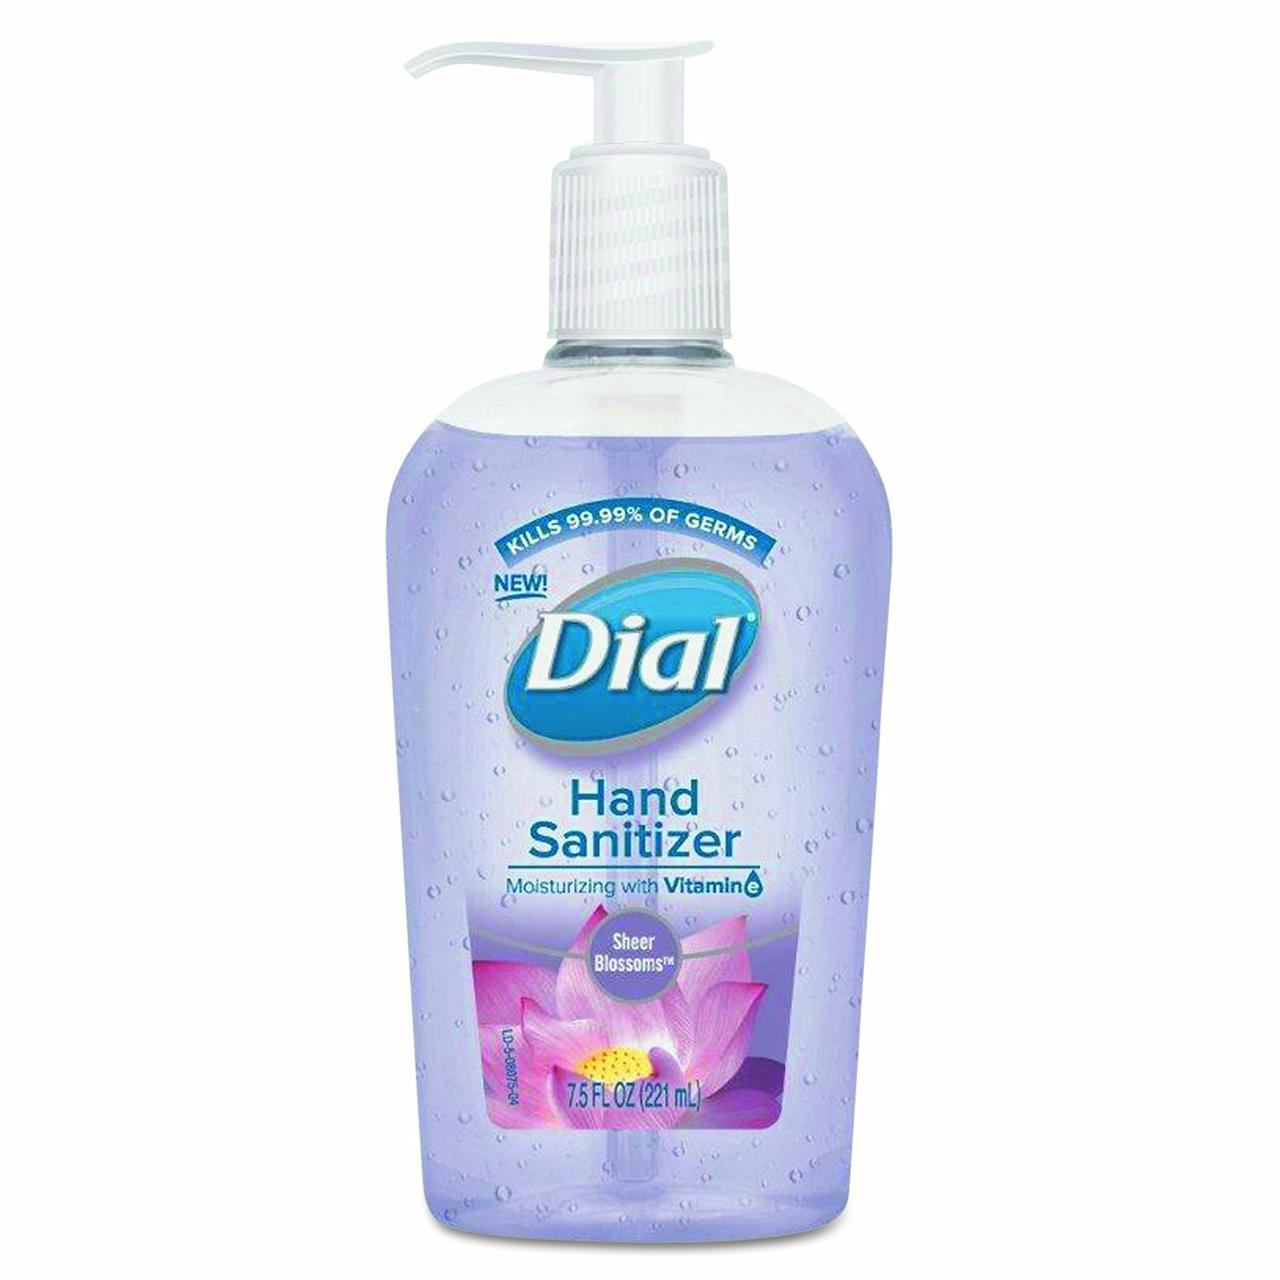 Dial Hand Sanitizer Sheer Blossoms 7.5 fl. oz. Pump by Henkel AG & Co